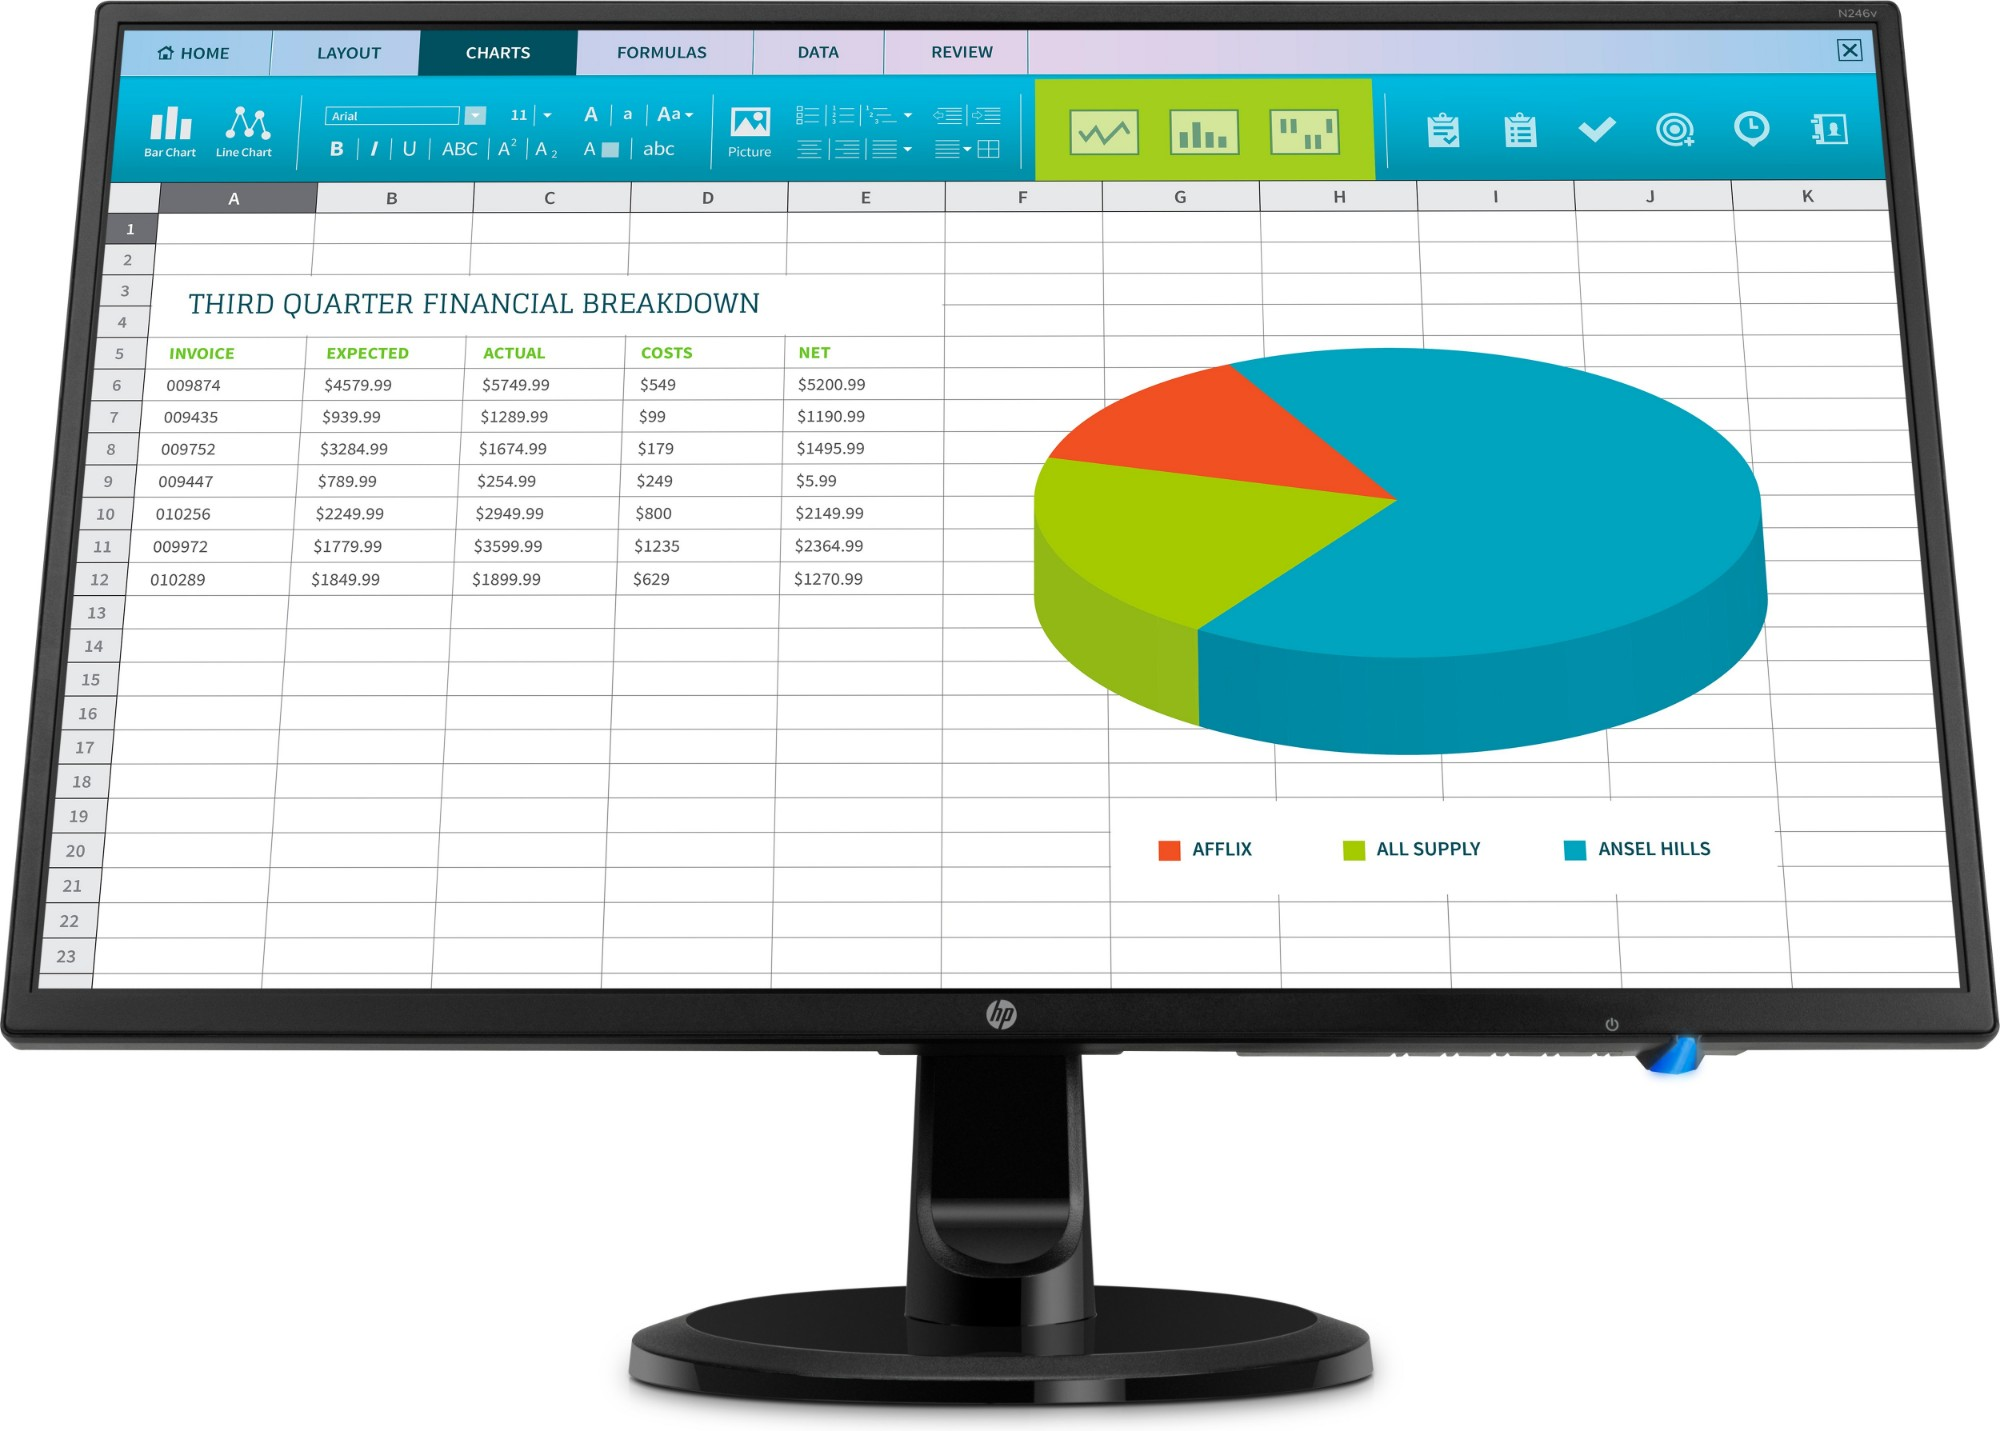 LED monitor - N246v - 23.8in